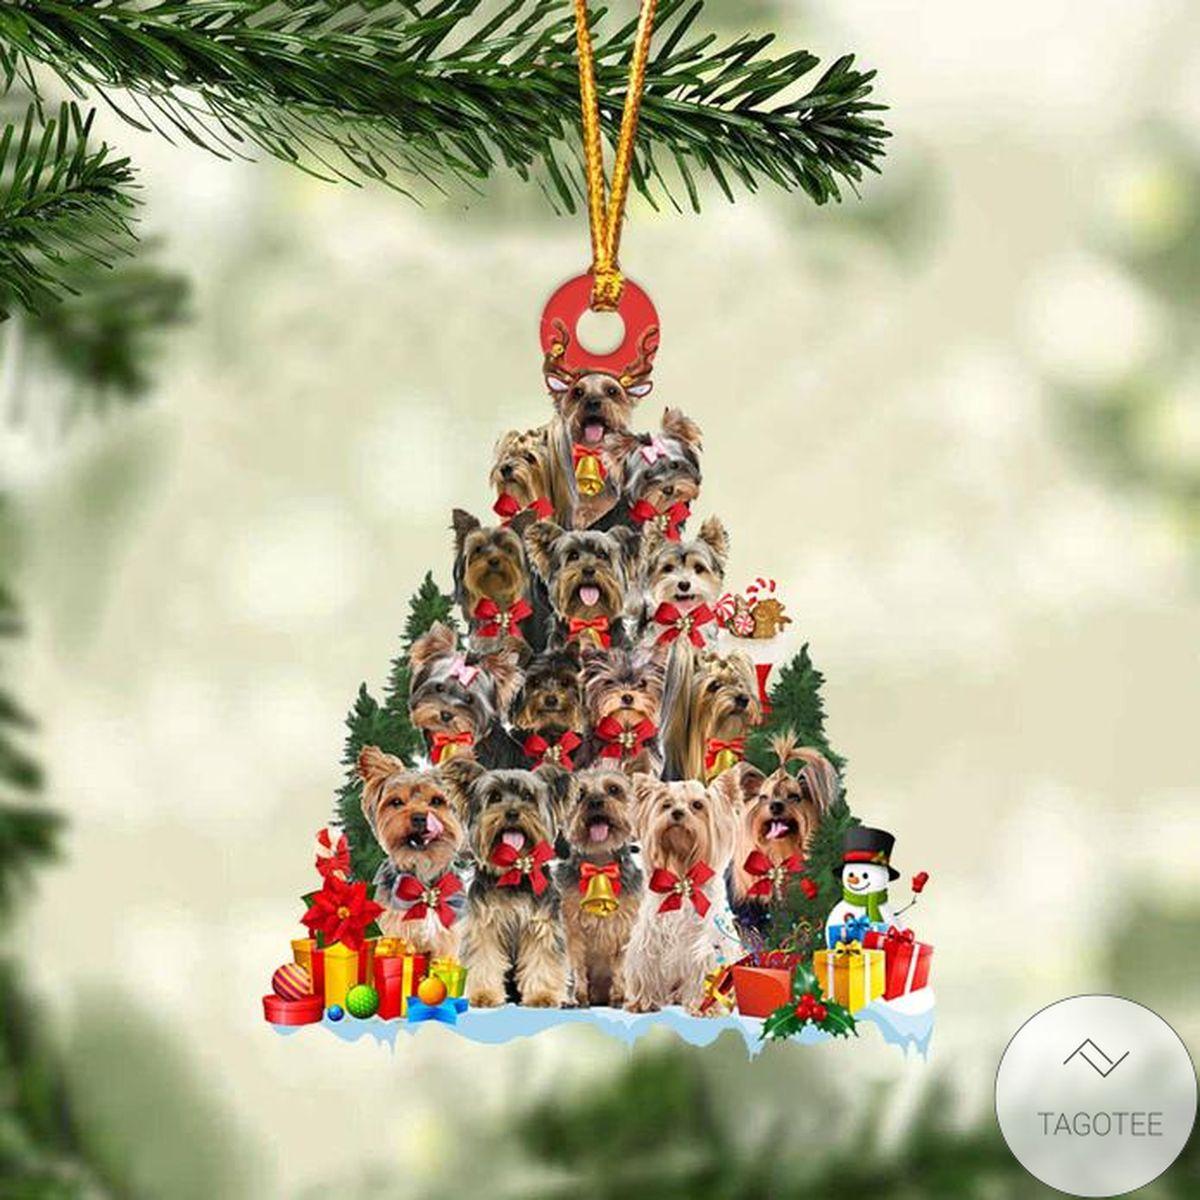 POD Yorkshire Terrier Dog Christmas Tree Ornament